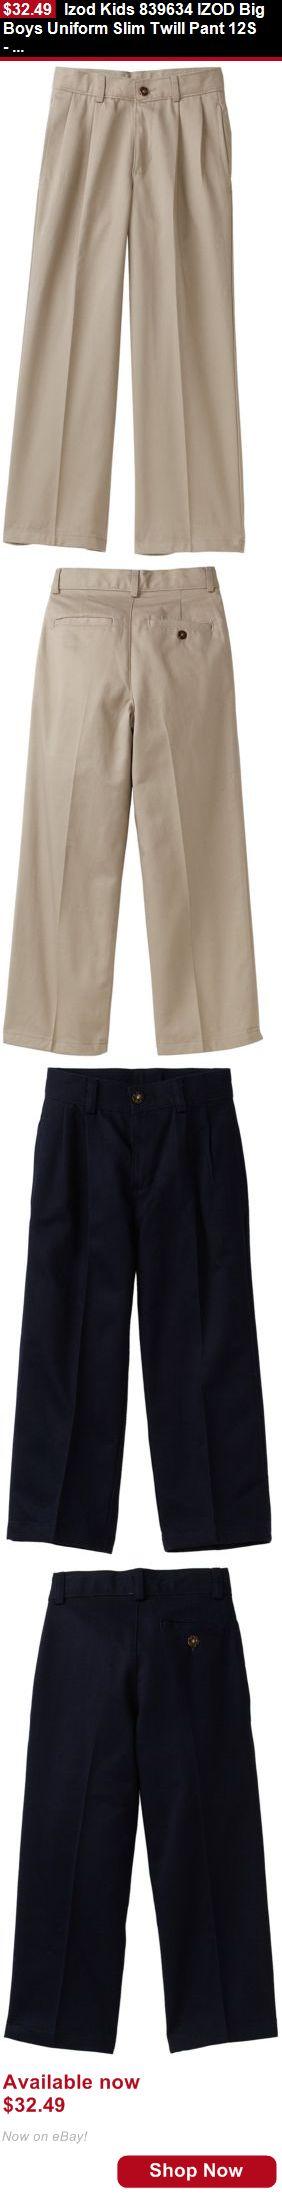 Boys uniforms: Izod Kids 839634 Izod Big Boys Uniform Slim Twill Pant 12S- Choose Sz/Color. BUY IT NOW ONLY: $32.49